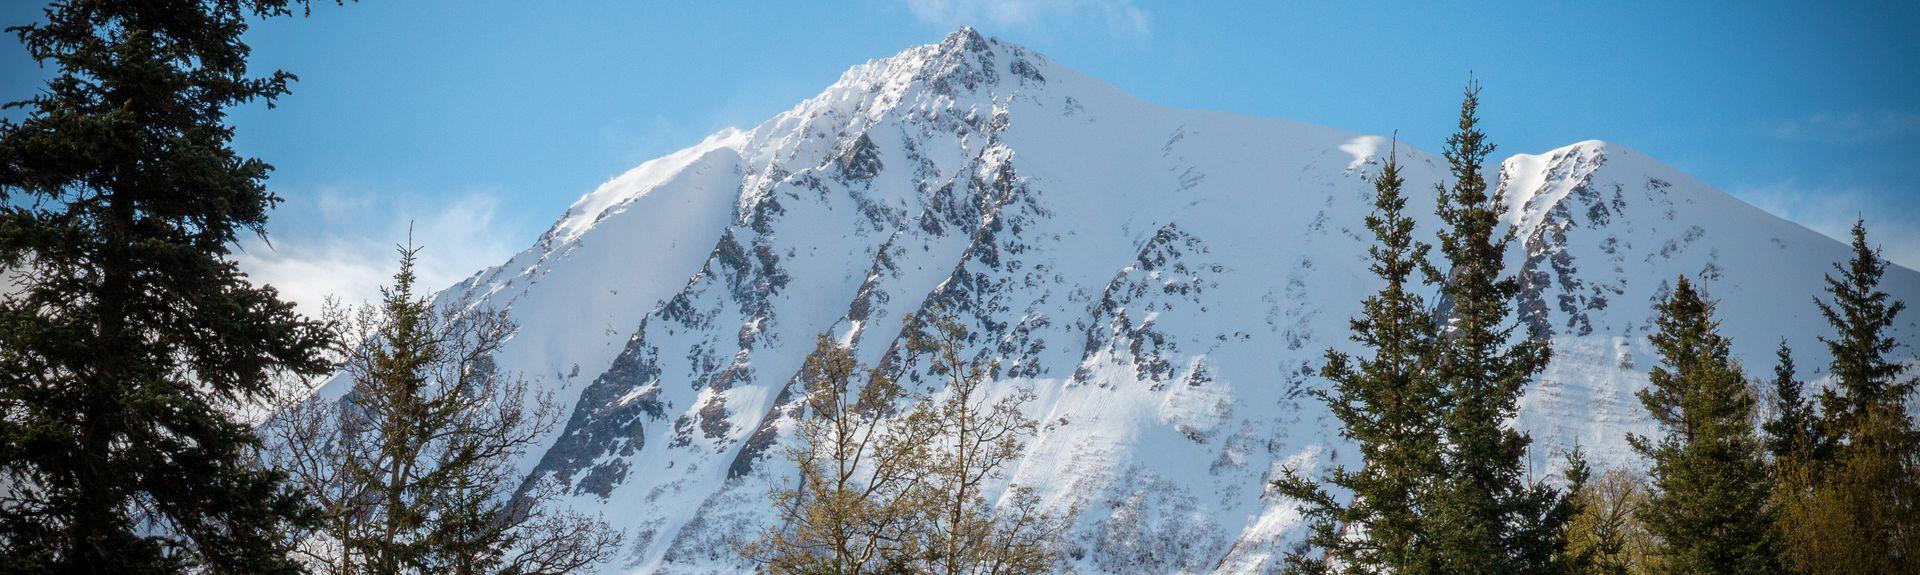 Moose Pass, Alaska, Stany Zjednoczone